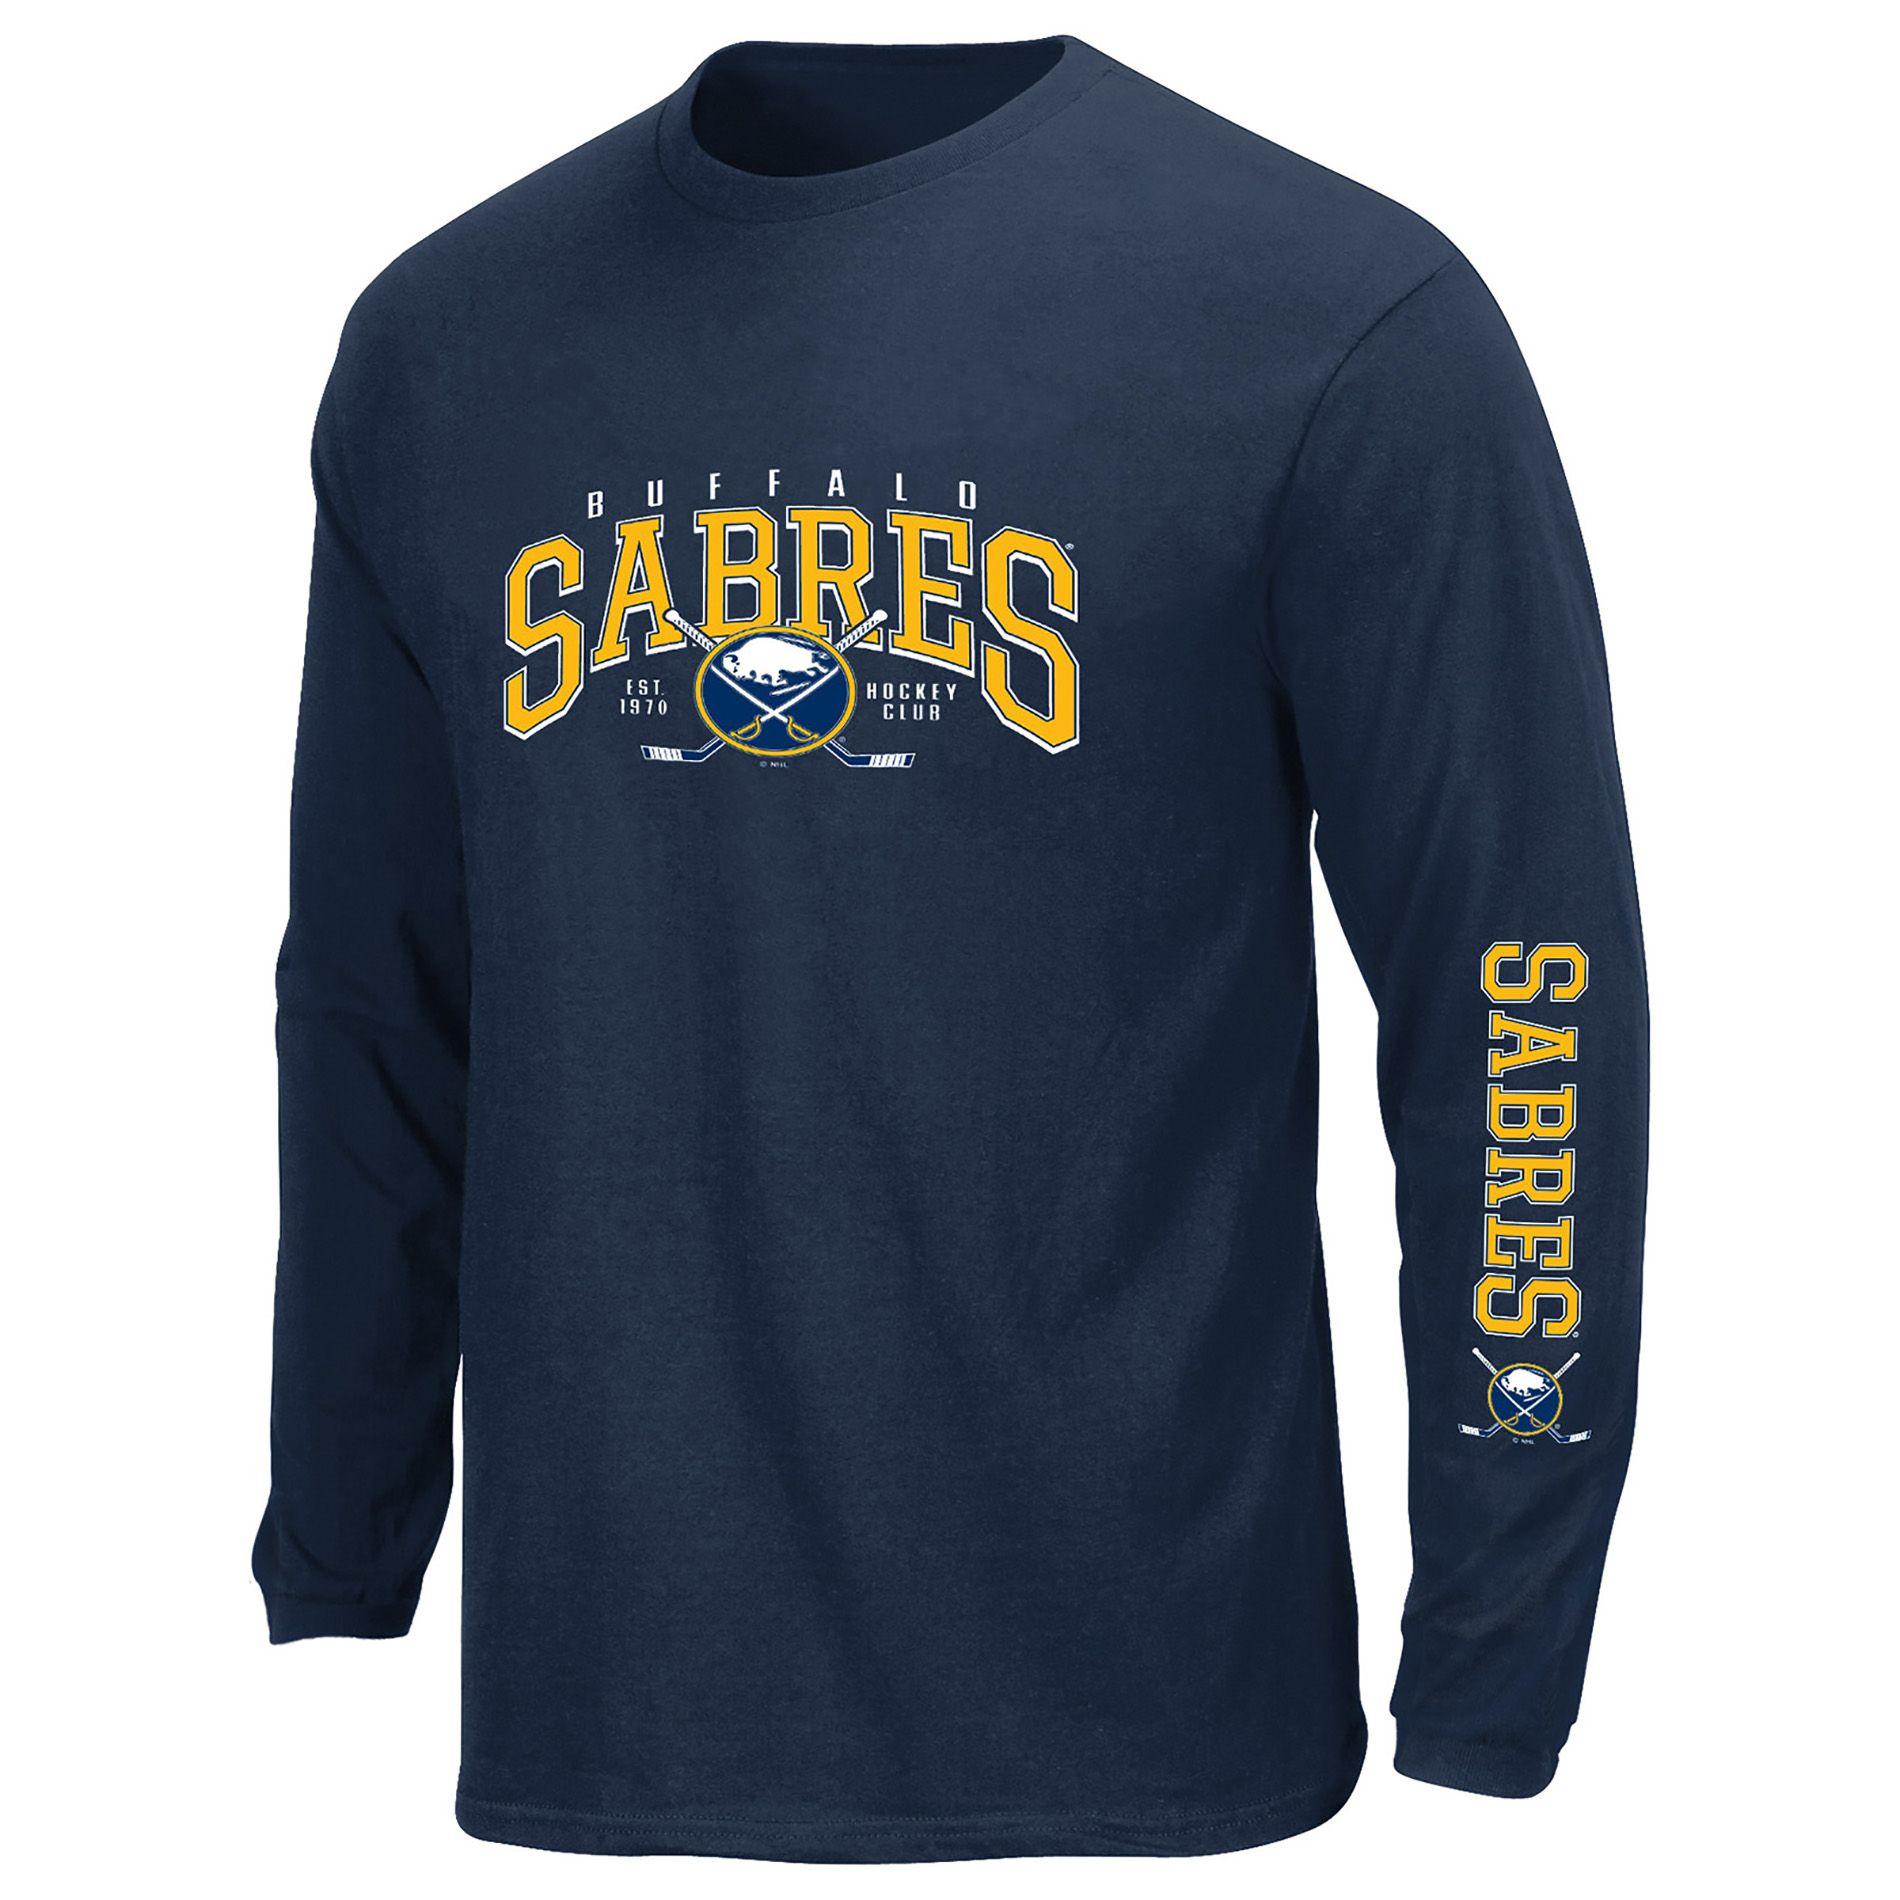 Nhl Mena S Buffalo Sabres Long Sleeve T Shirt Size Large Long Sleeve Tshirt Men Long Sleeve Sleeves [ 1900 x 1900 Pixel ]